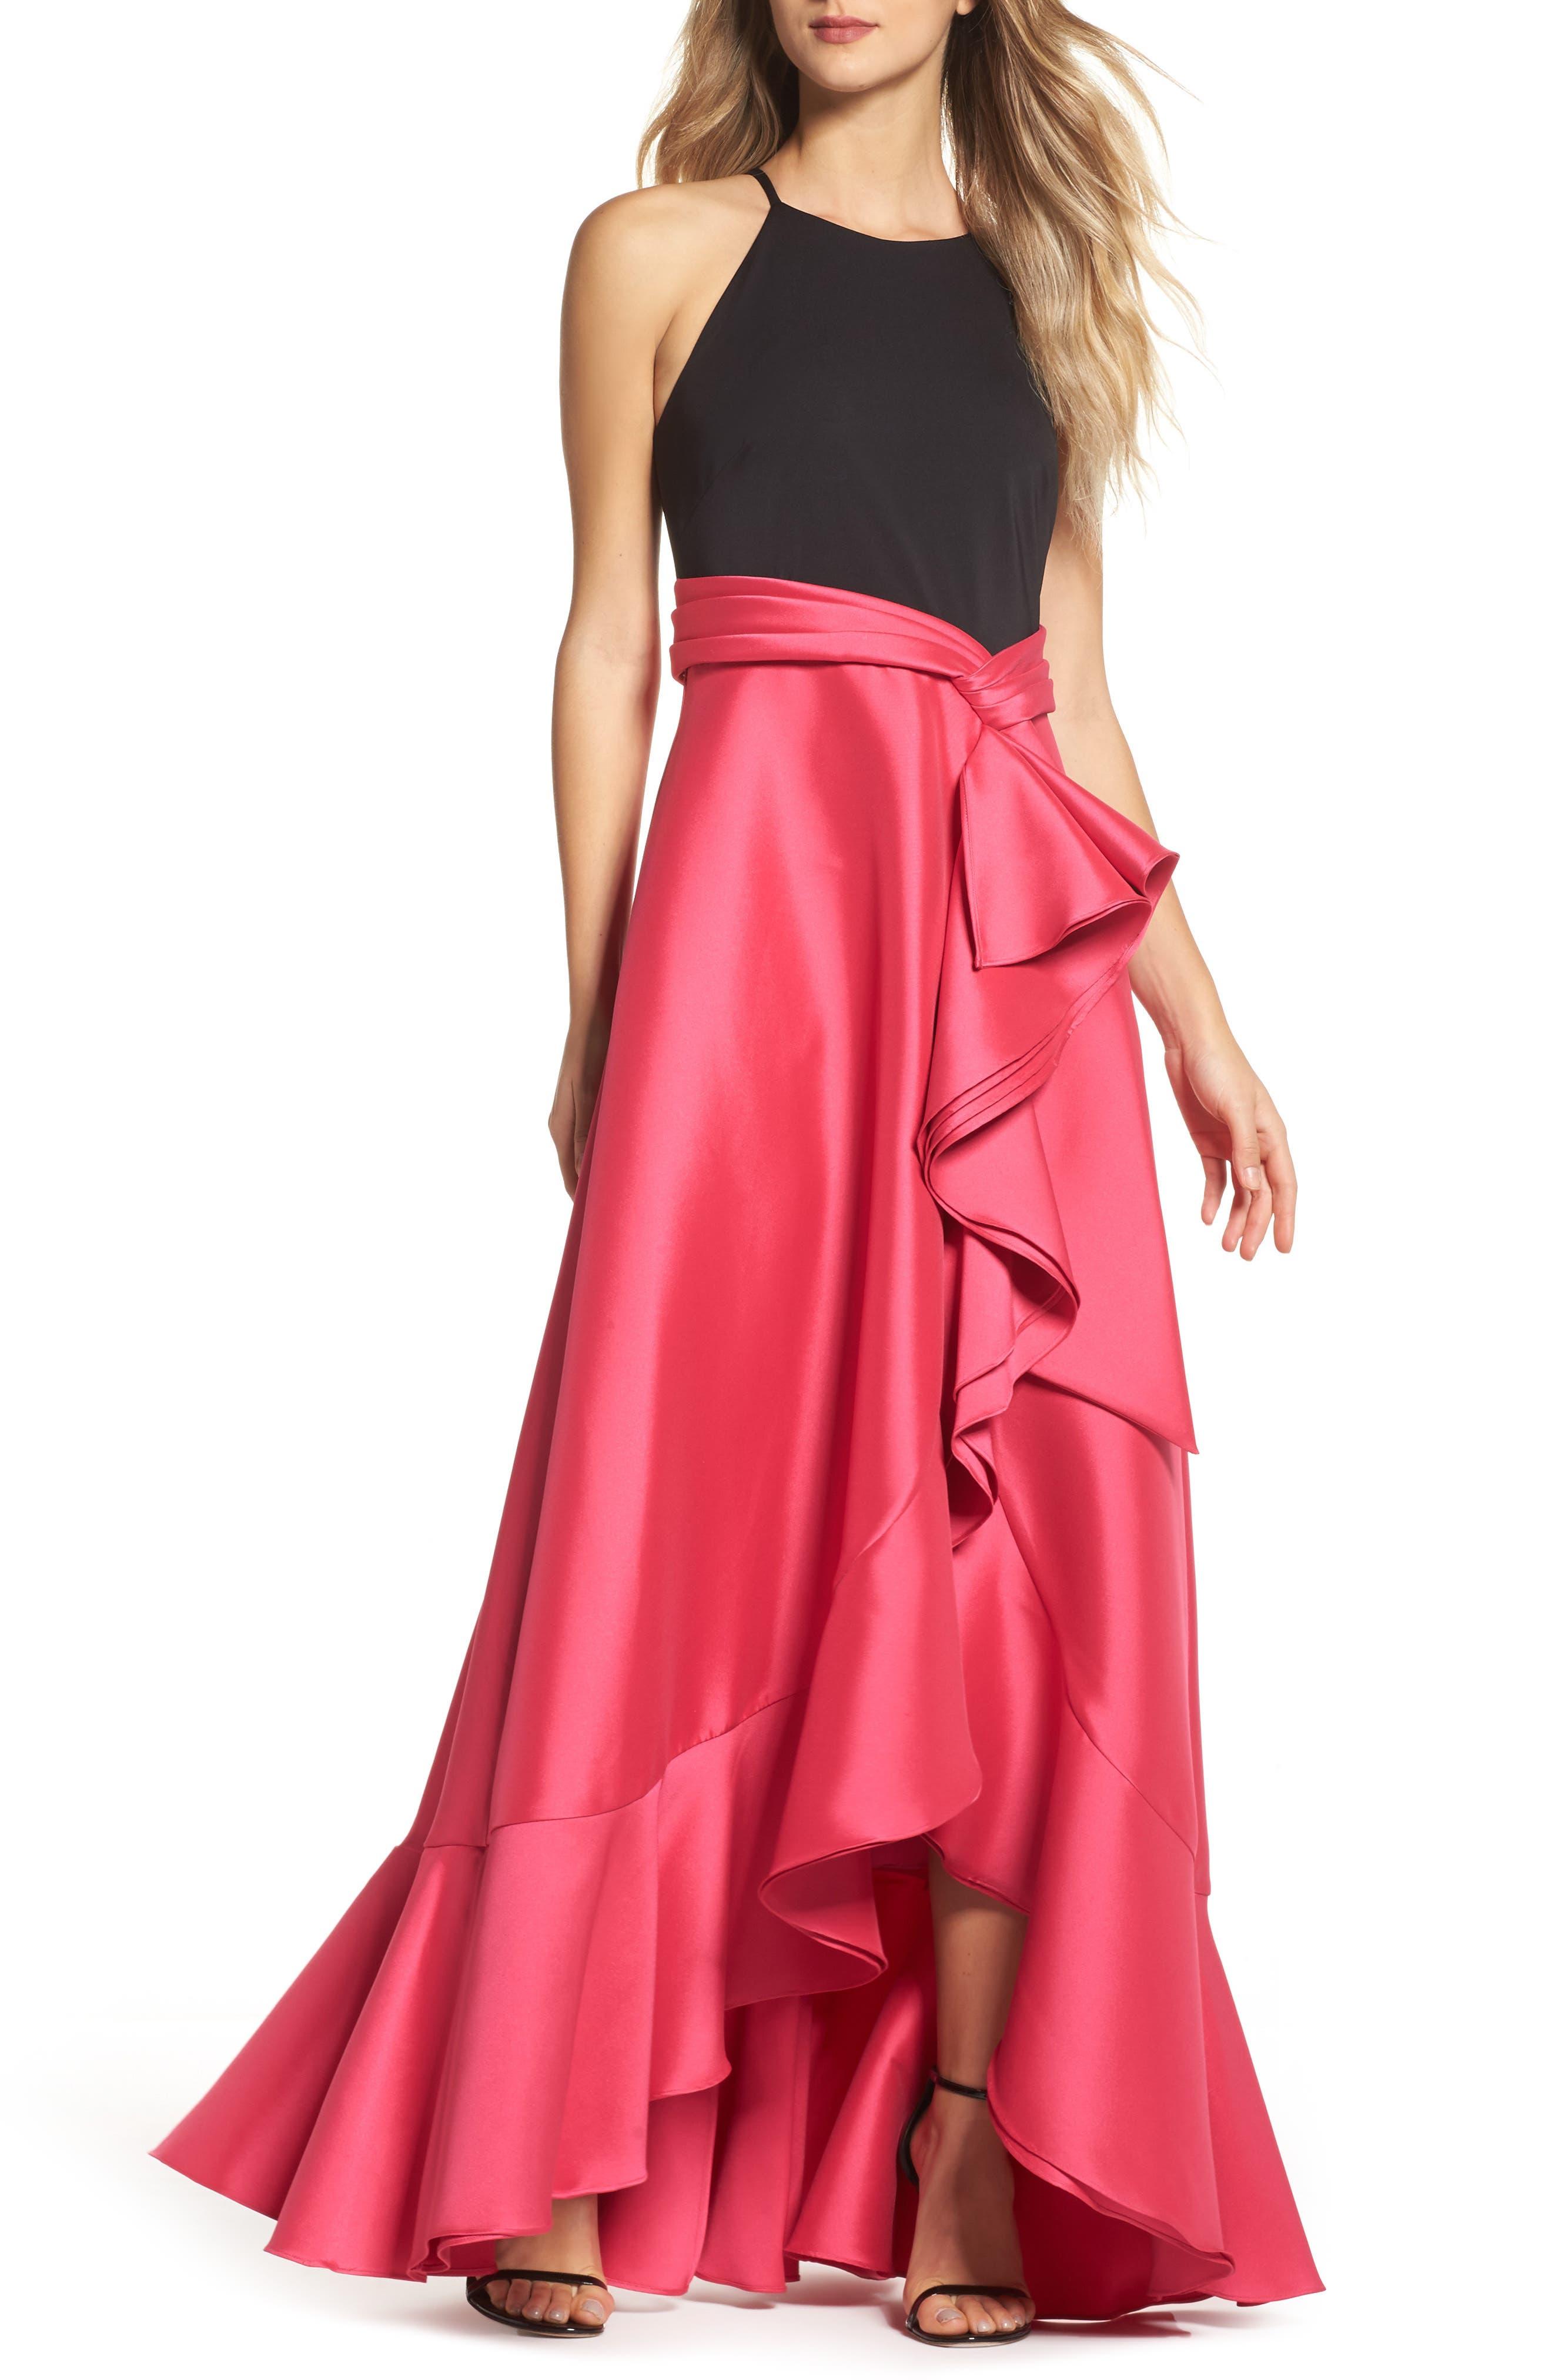 Badgley Mischka Two-Tone Ruffle Gown